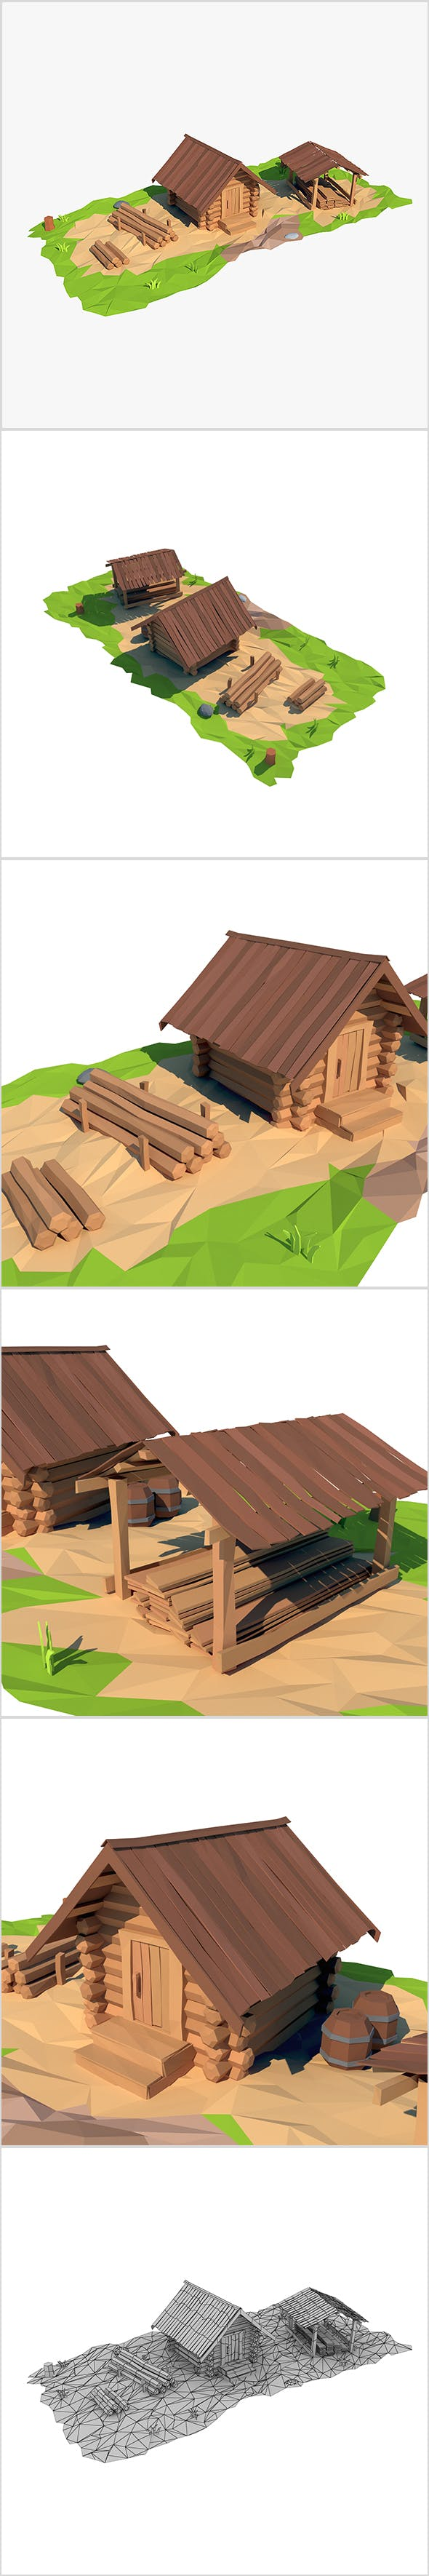 Cartoon wooden sawmill - 3DOcean Item for Sale